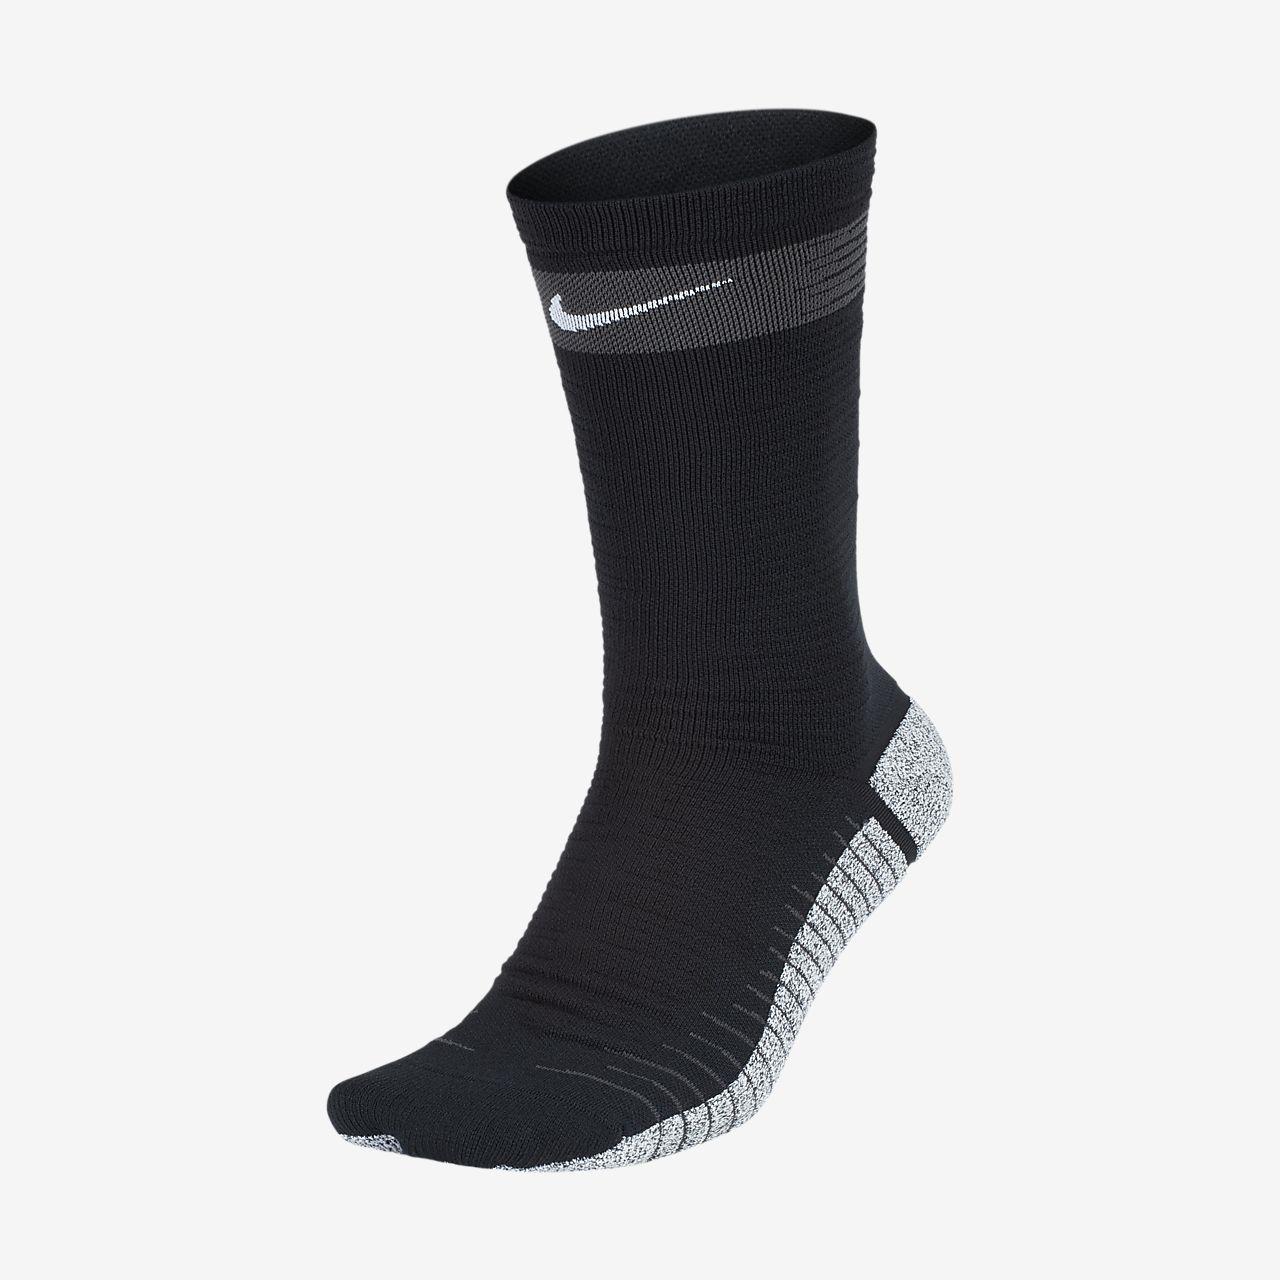 NikeGrip Strike Light Crew Football Socks